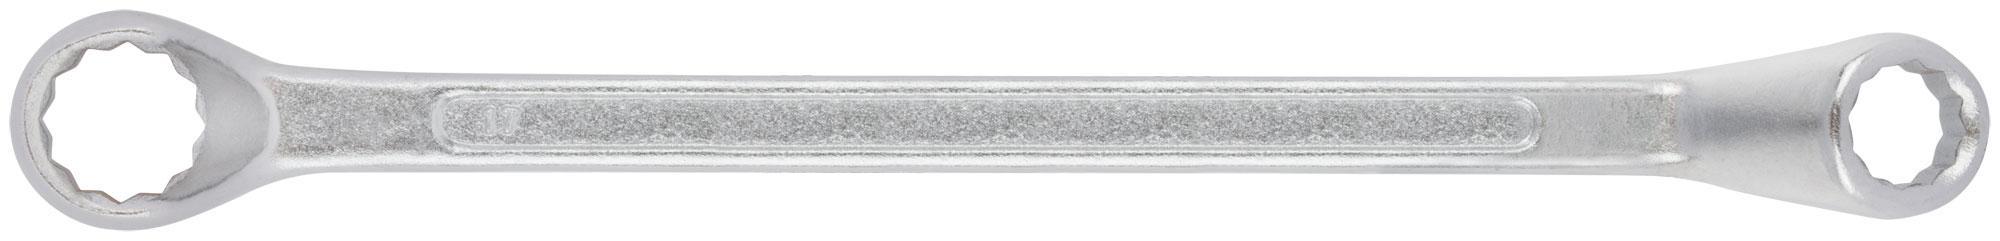 Ключ гаечный накидной 13х17 Fit 63533 (13 / 17 мм)